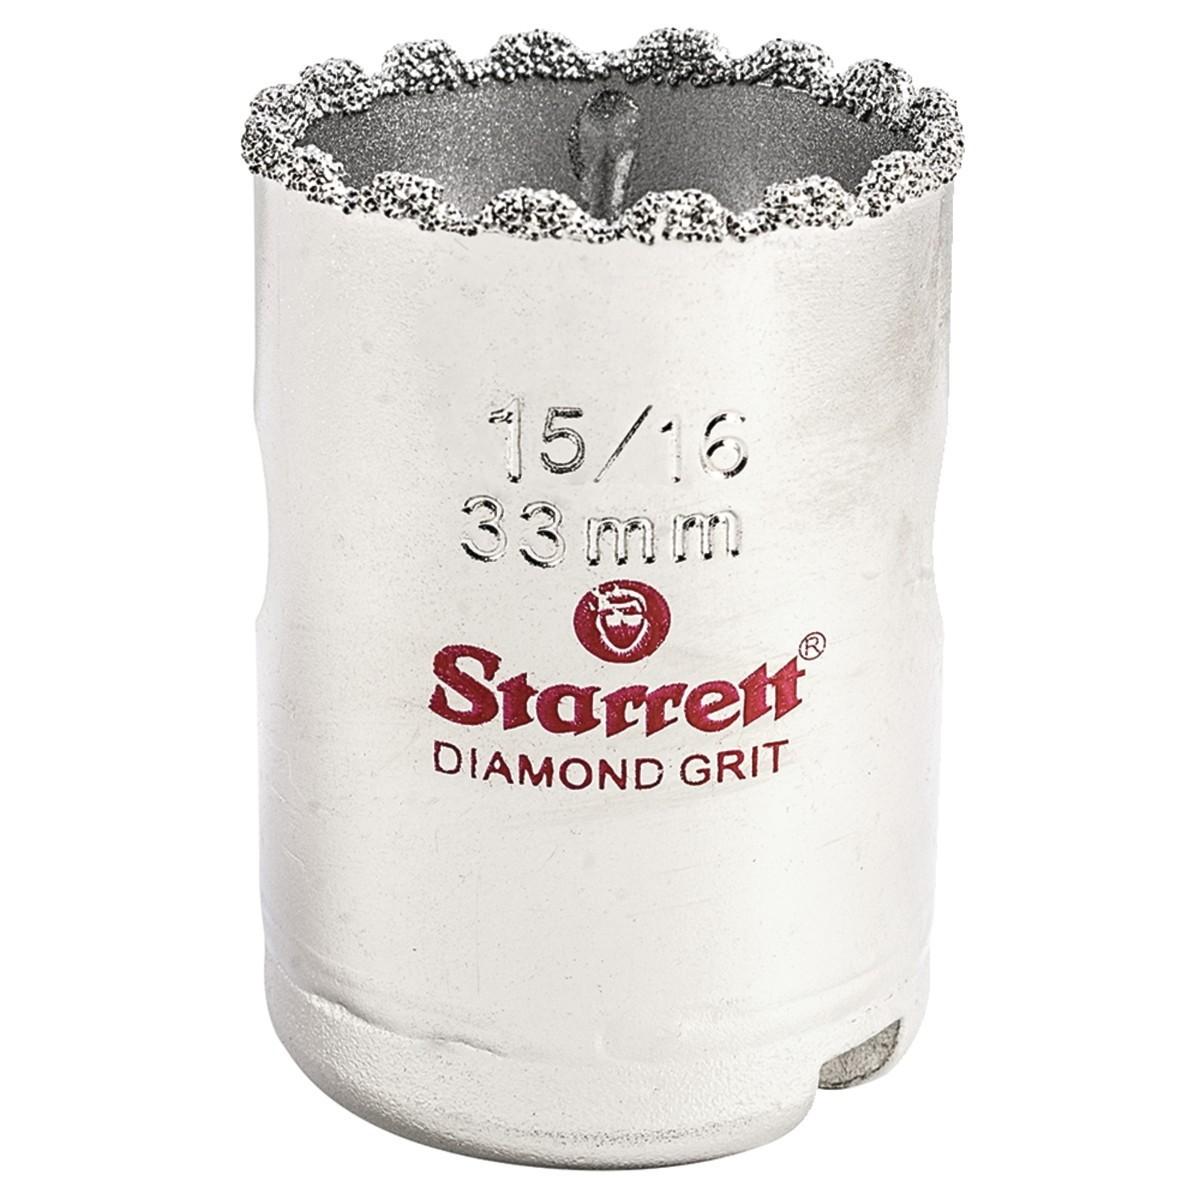 SERRA COPO DIAMANTADA 1.5/16 STARRETT KD0156-N